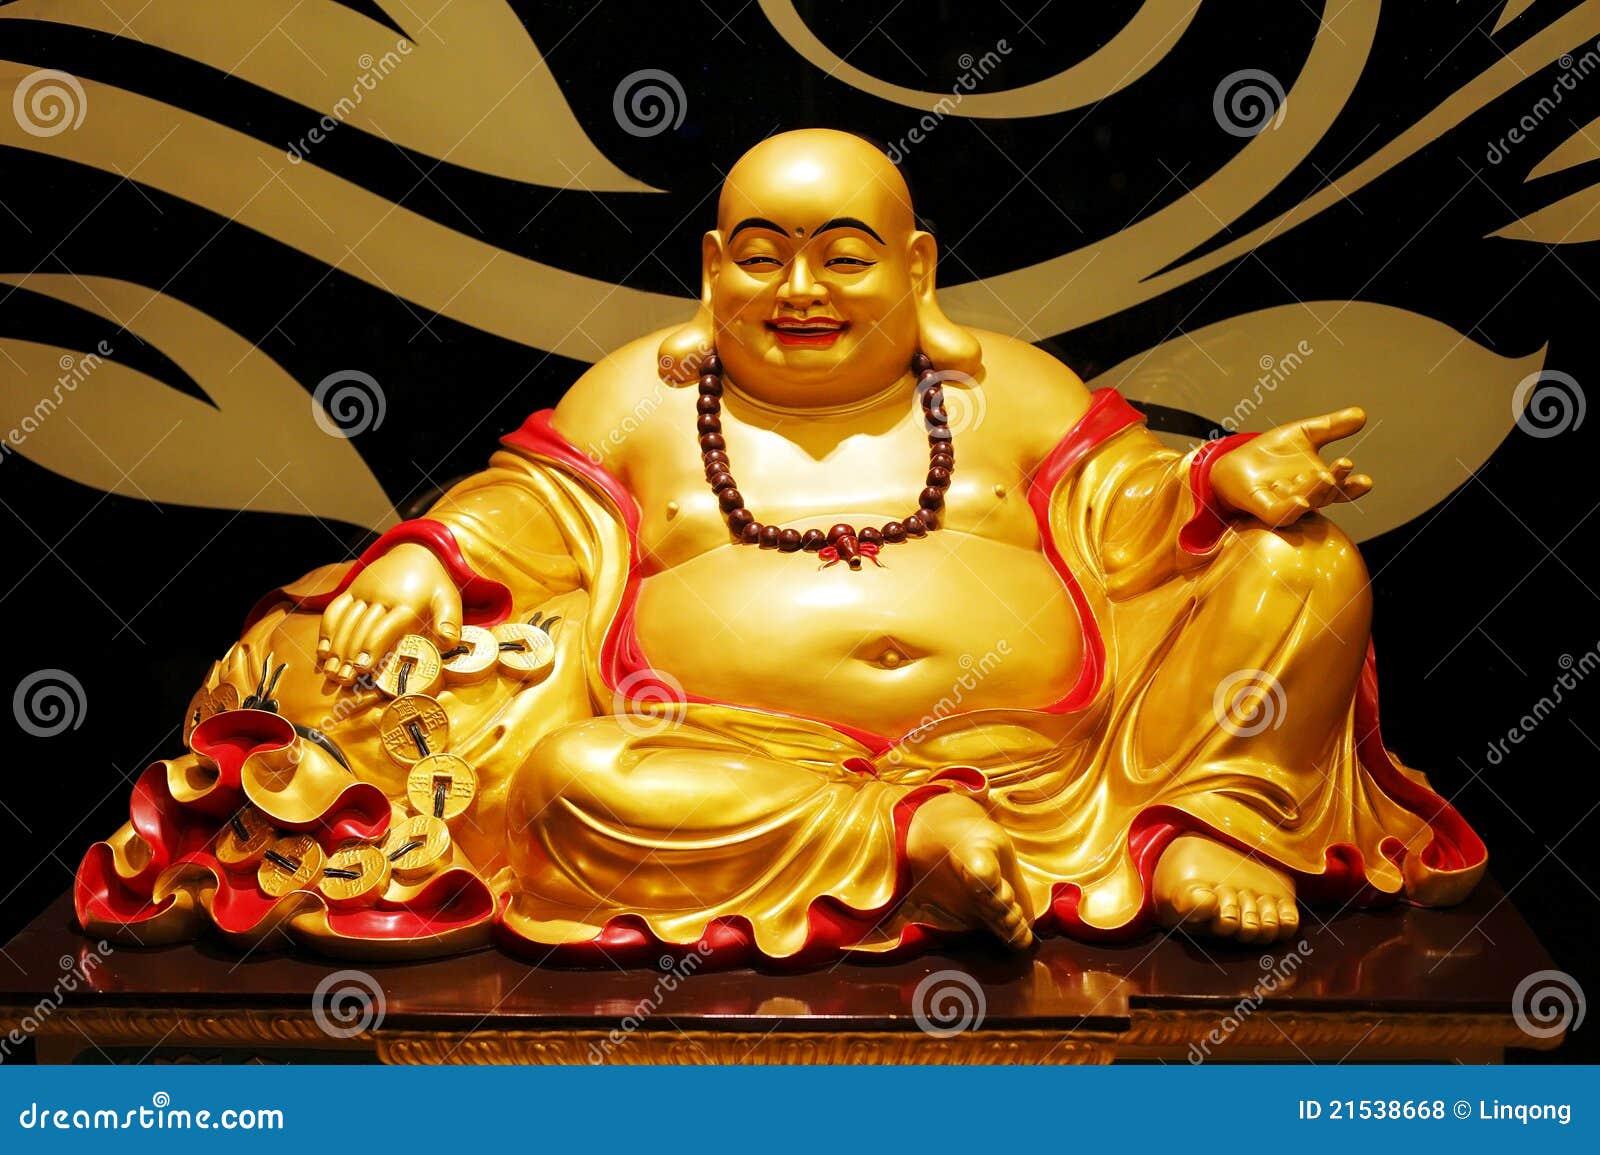 golden buddha statue stock photo image of buddhism traditional